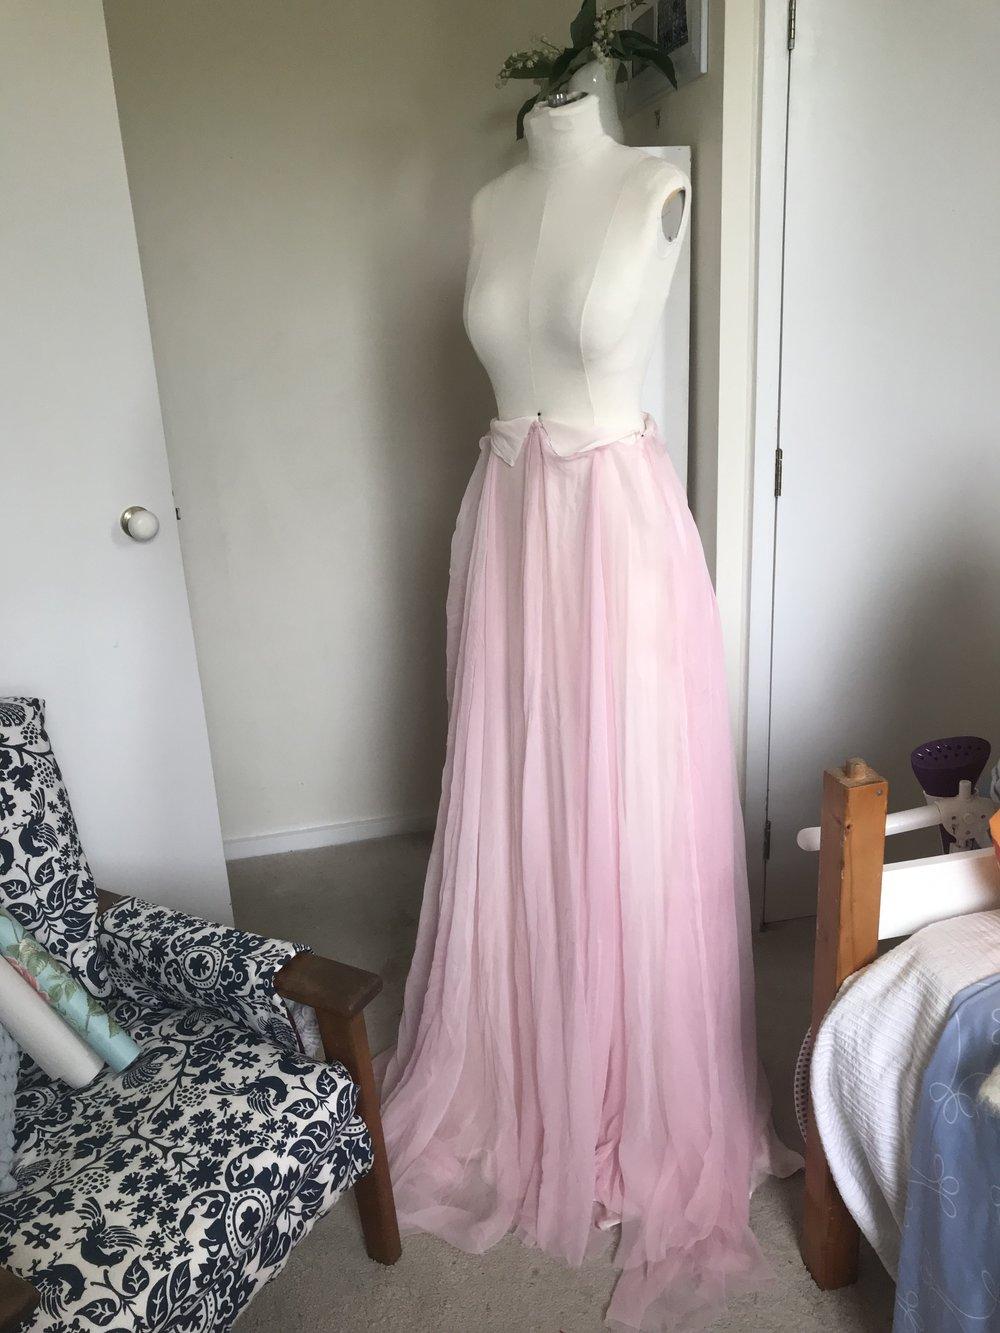 Skirt Layer 2: Pink Silk Gauze